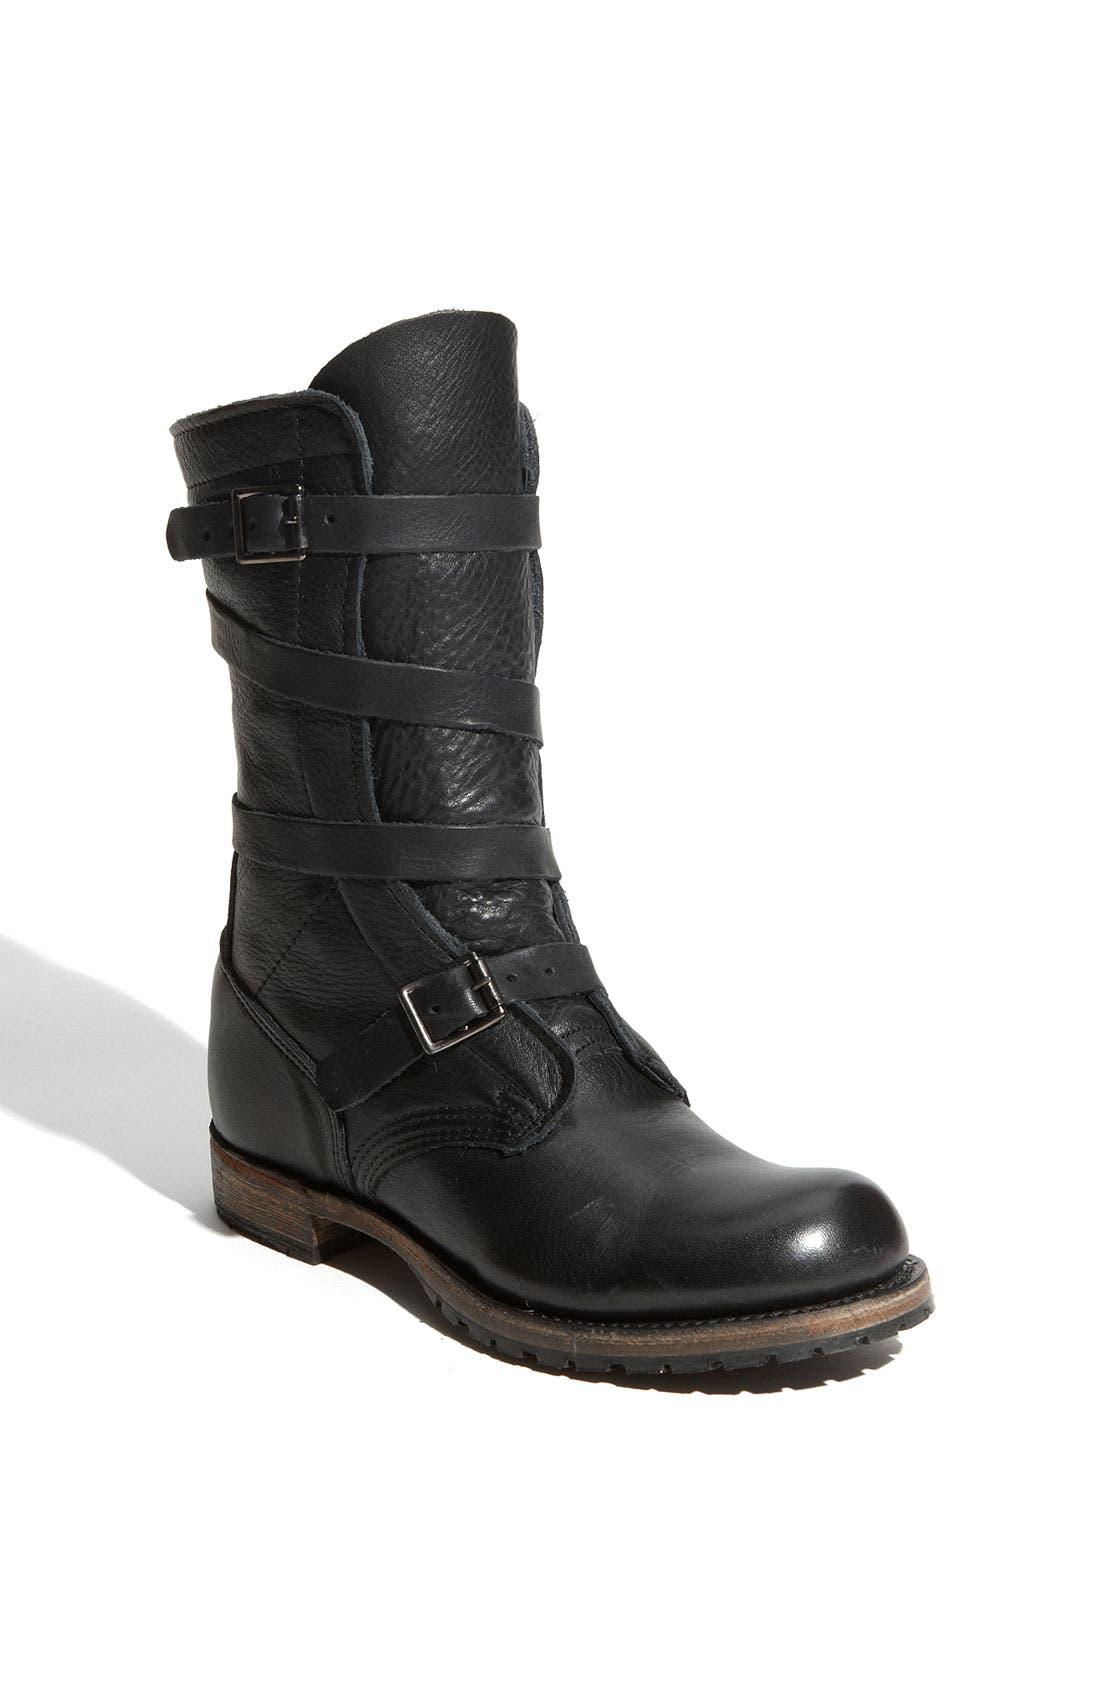 Alternate Image 1 Selected - Vintage Shoe Company 'Jennifer' Boot